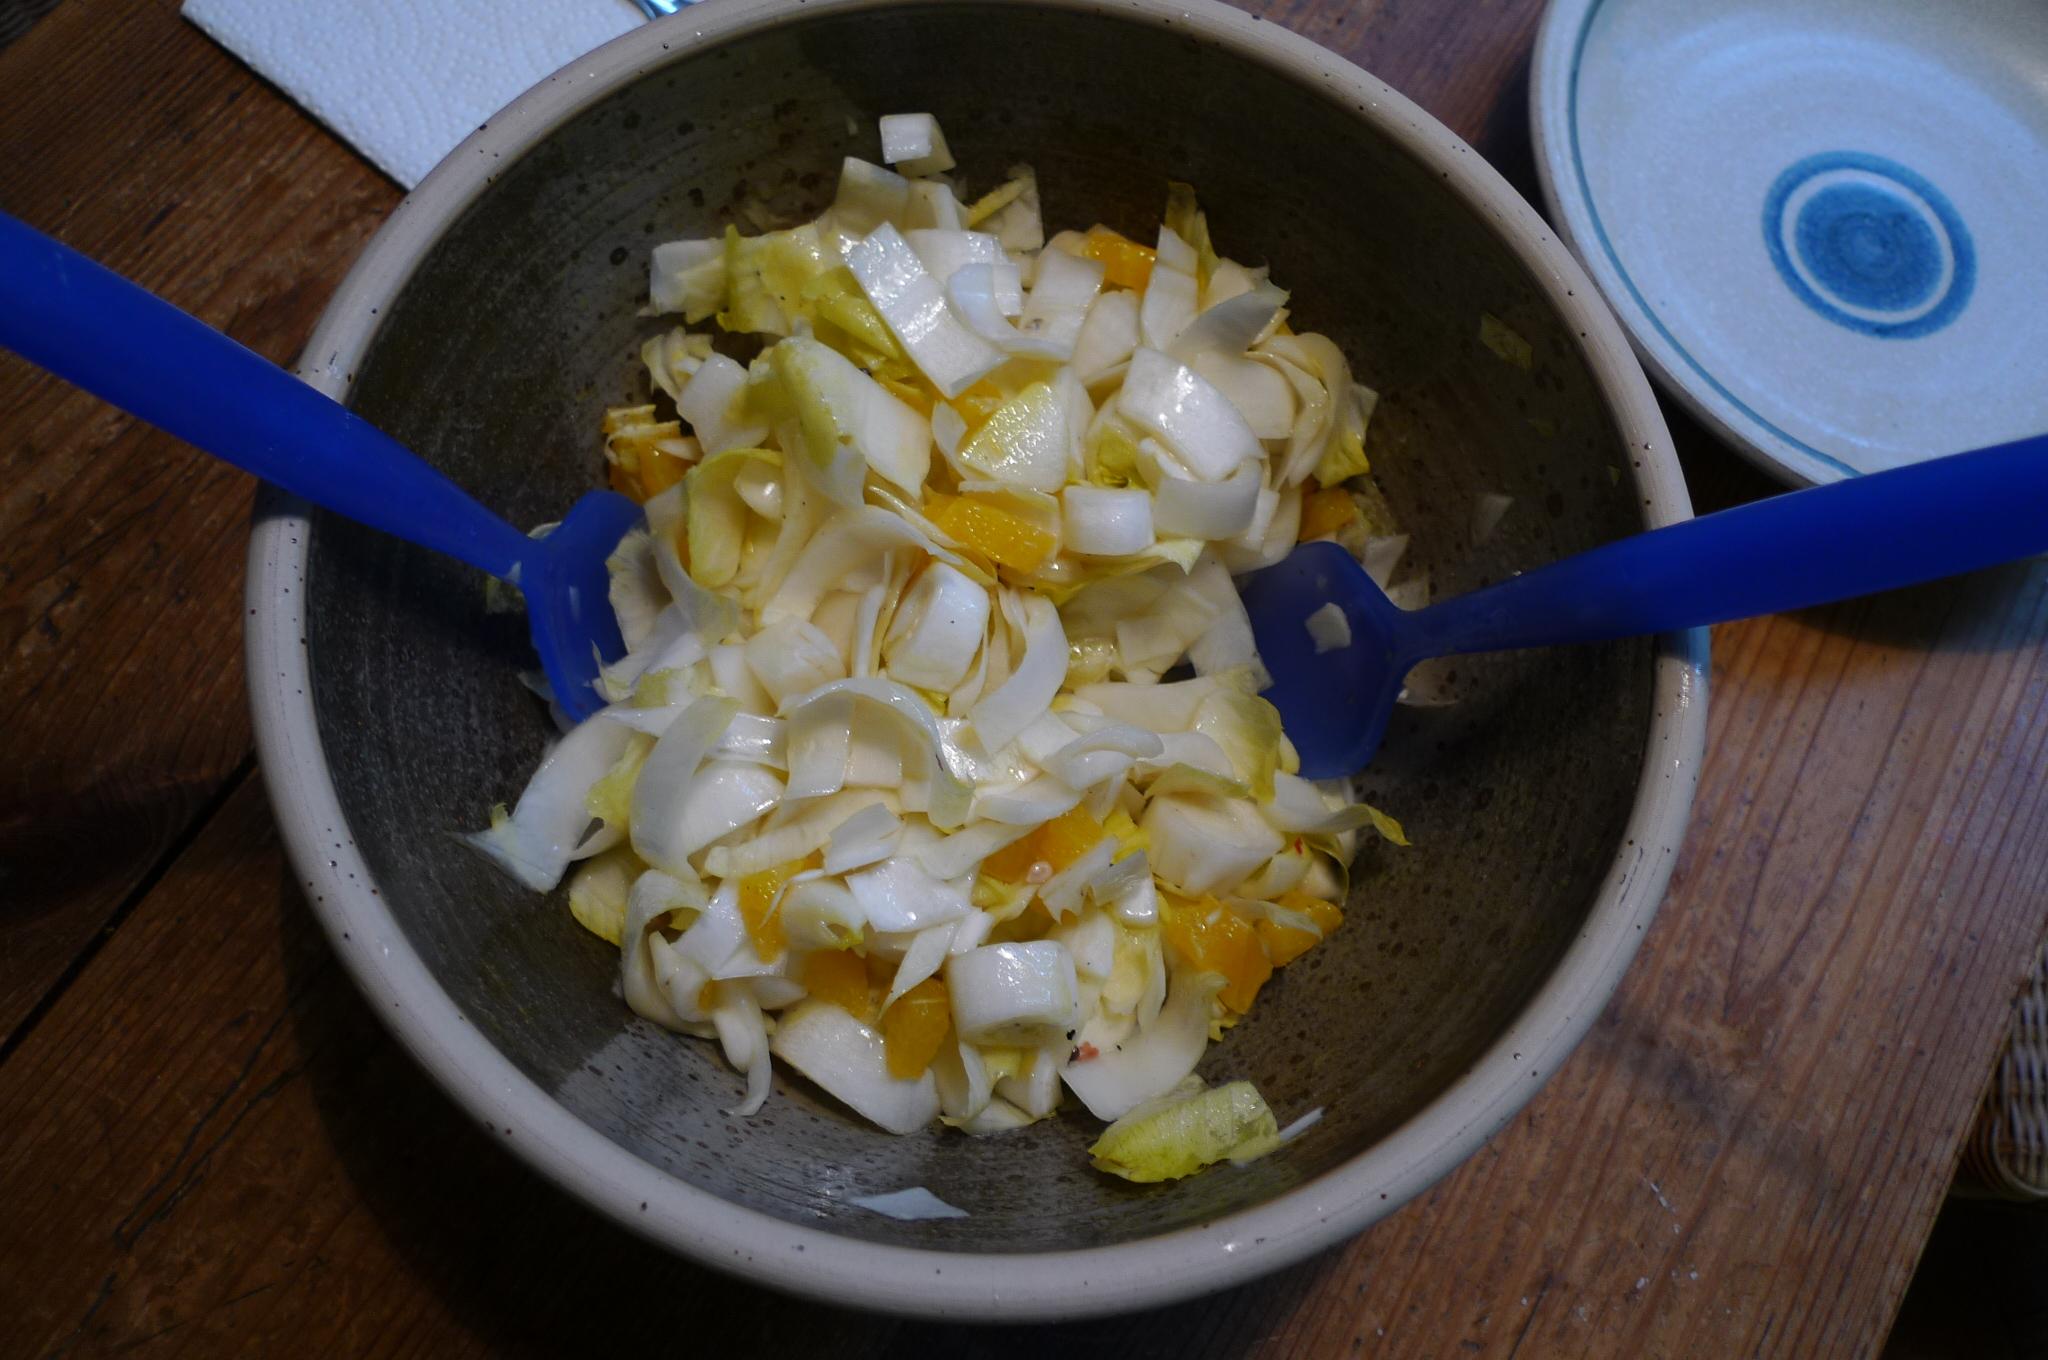 Kabeljau,Chicoreesalat,Kartoffeln,Quarkspeise - 17.2.15   (6)